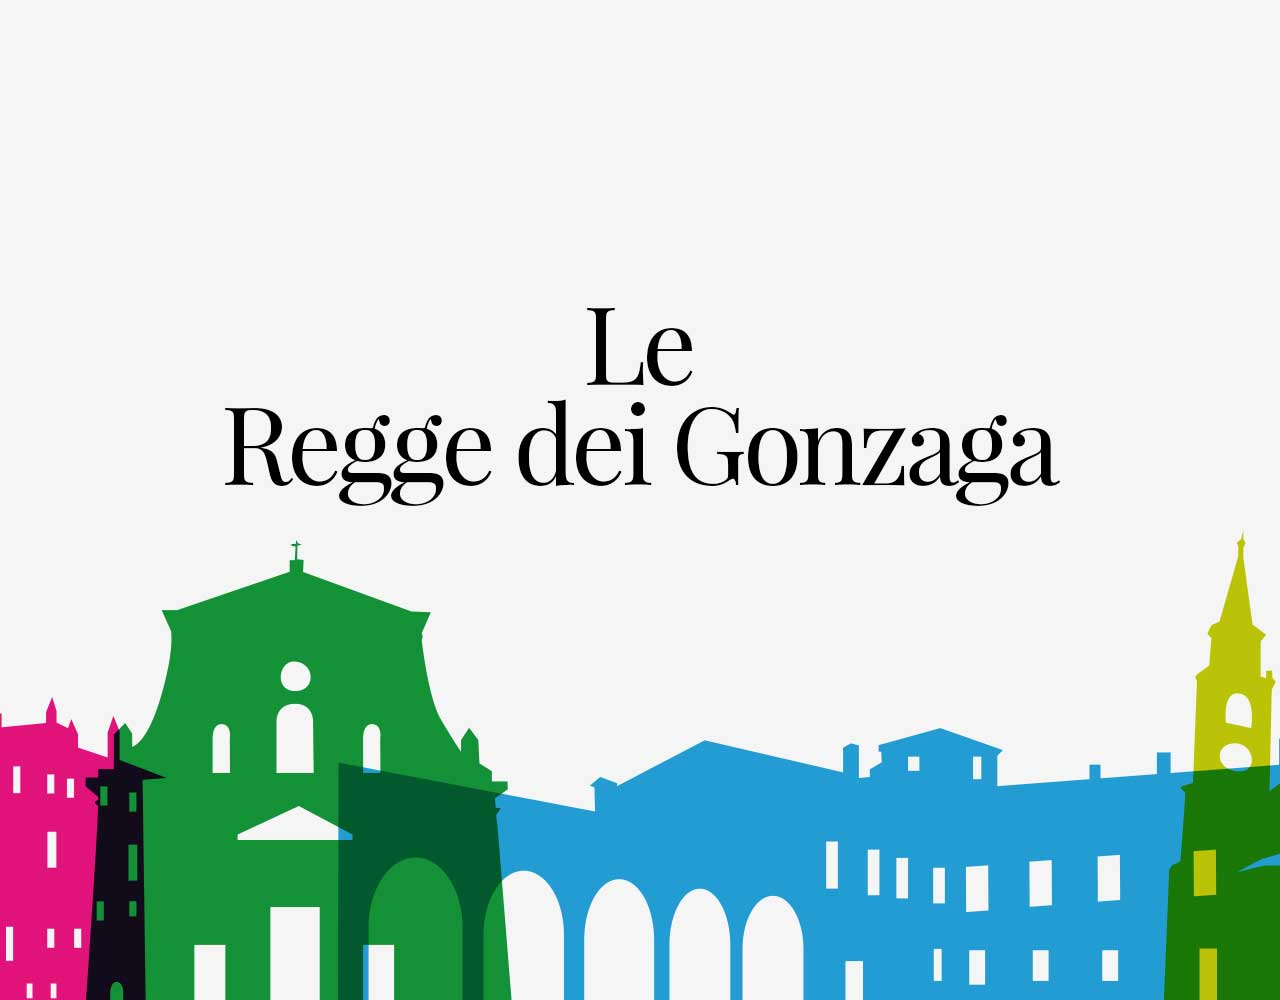 Le Regge dei Gonzaga - Mantova